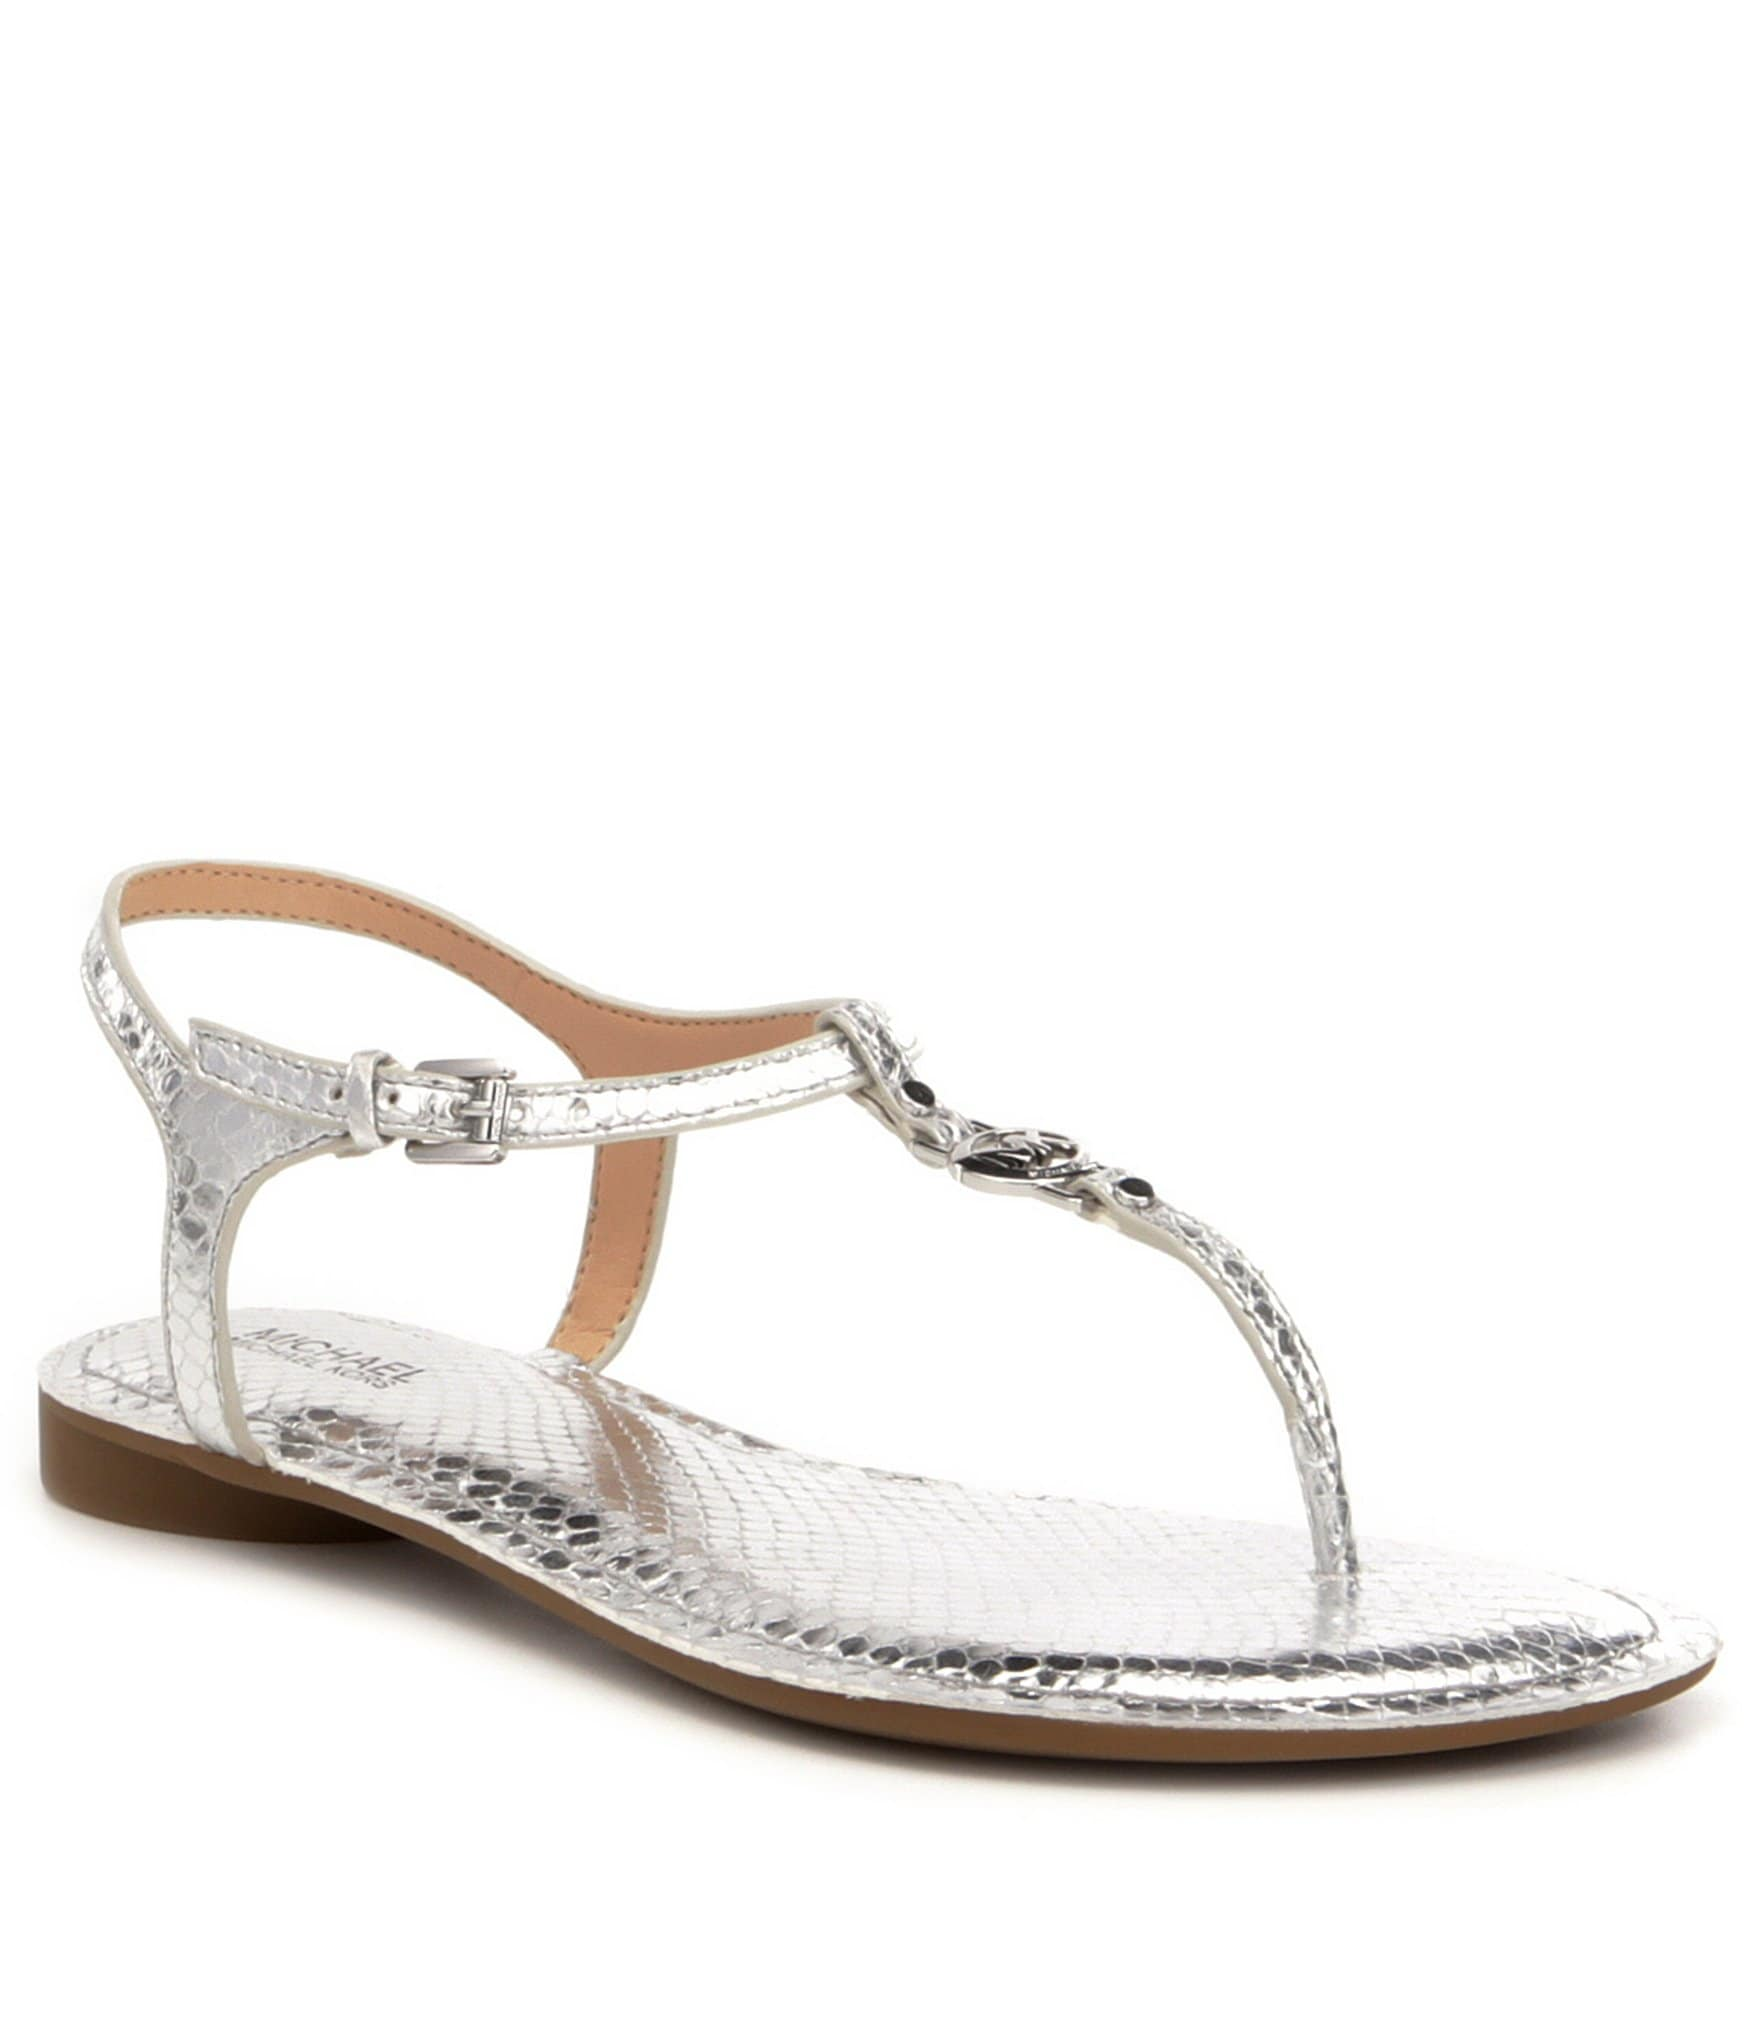 Michael Michael Kors Bethany Thong Sandals Dillards